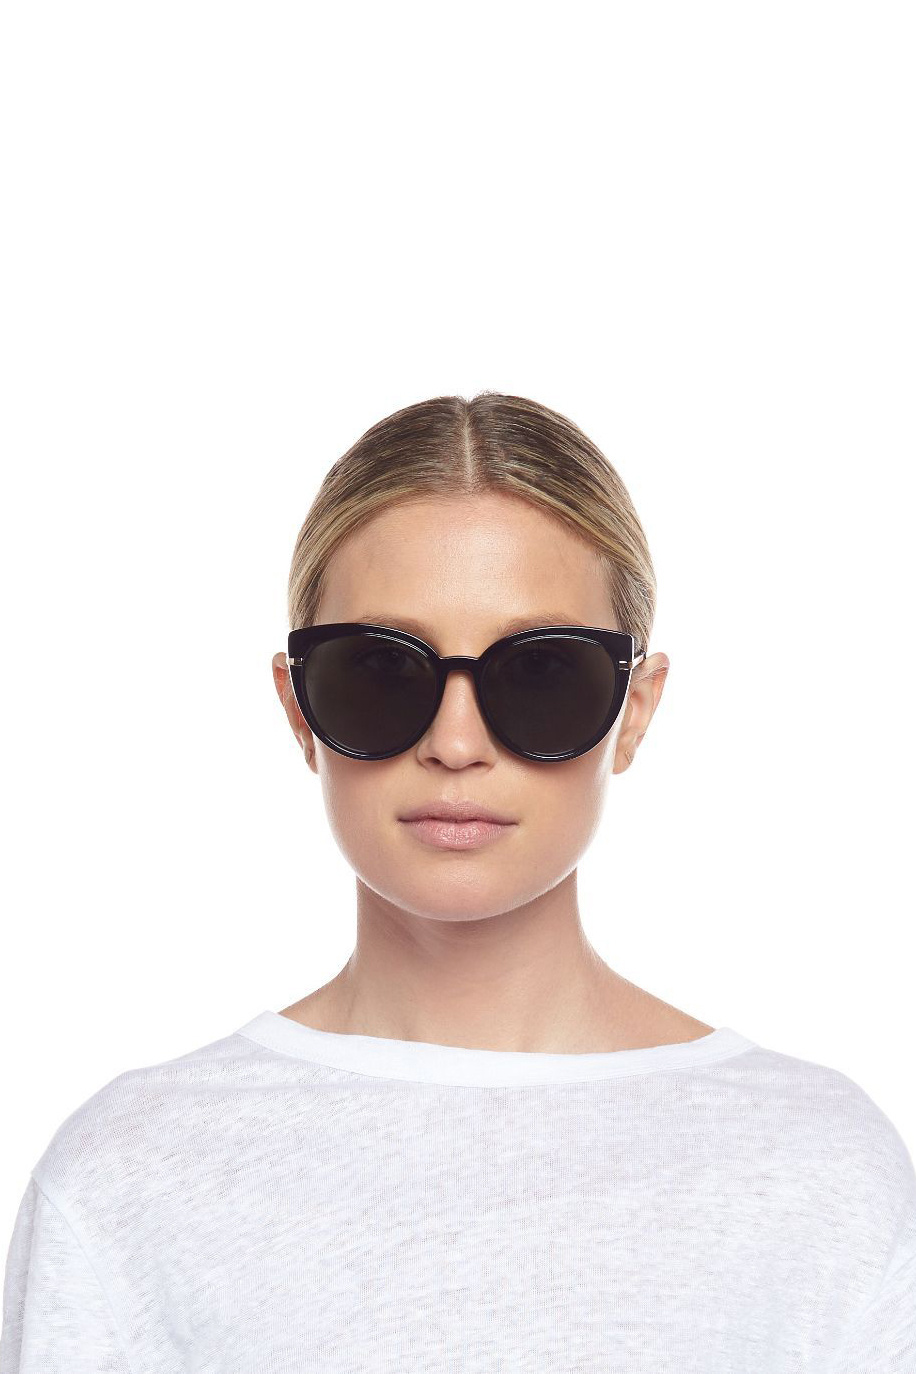 Promiscuous *Polarized* Sunglasses - Black-2